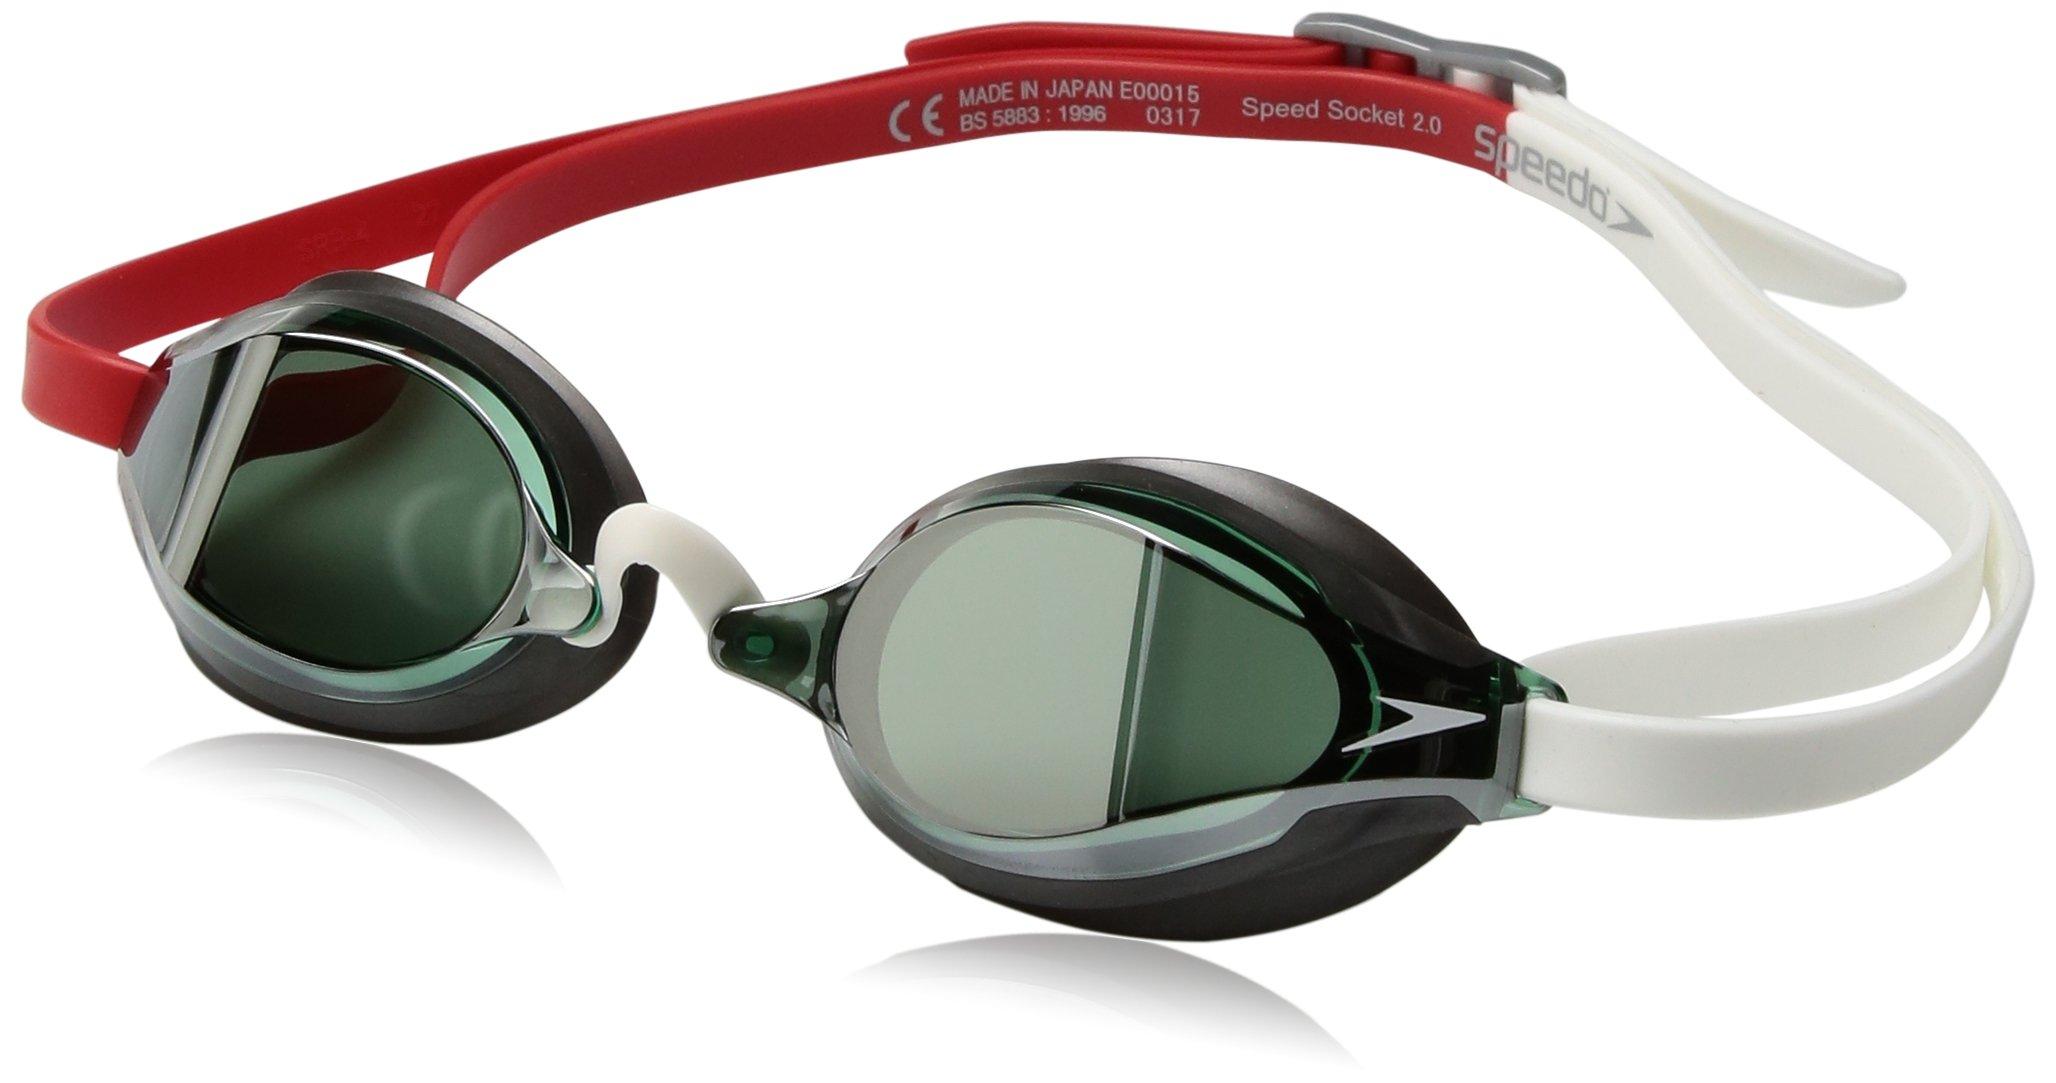 Speedo Speed Socket 2.0 Mirrored Swim Goggles, Curved, Anti-Glare, Anti-Fog with UV Protection, Fiery Red, 1SZ